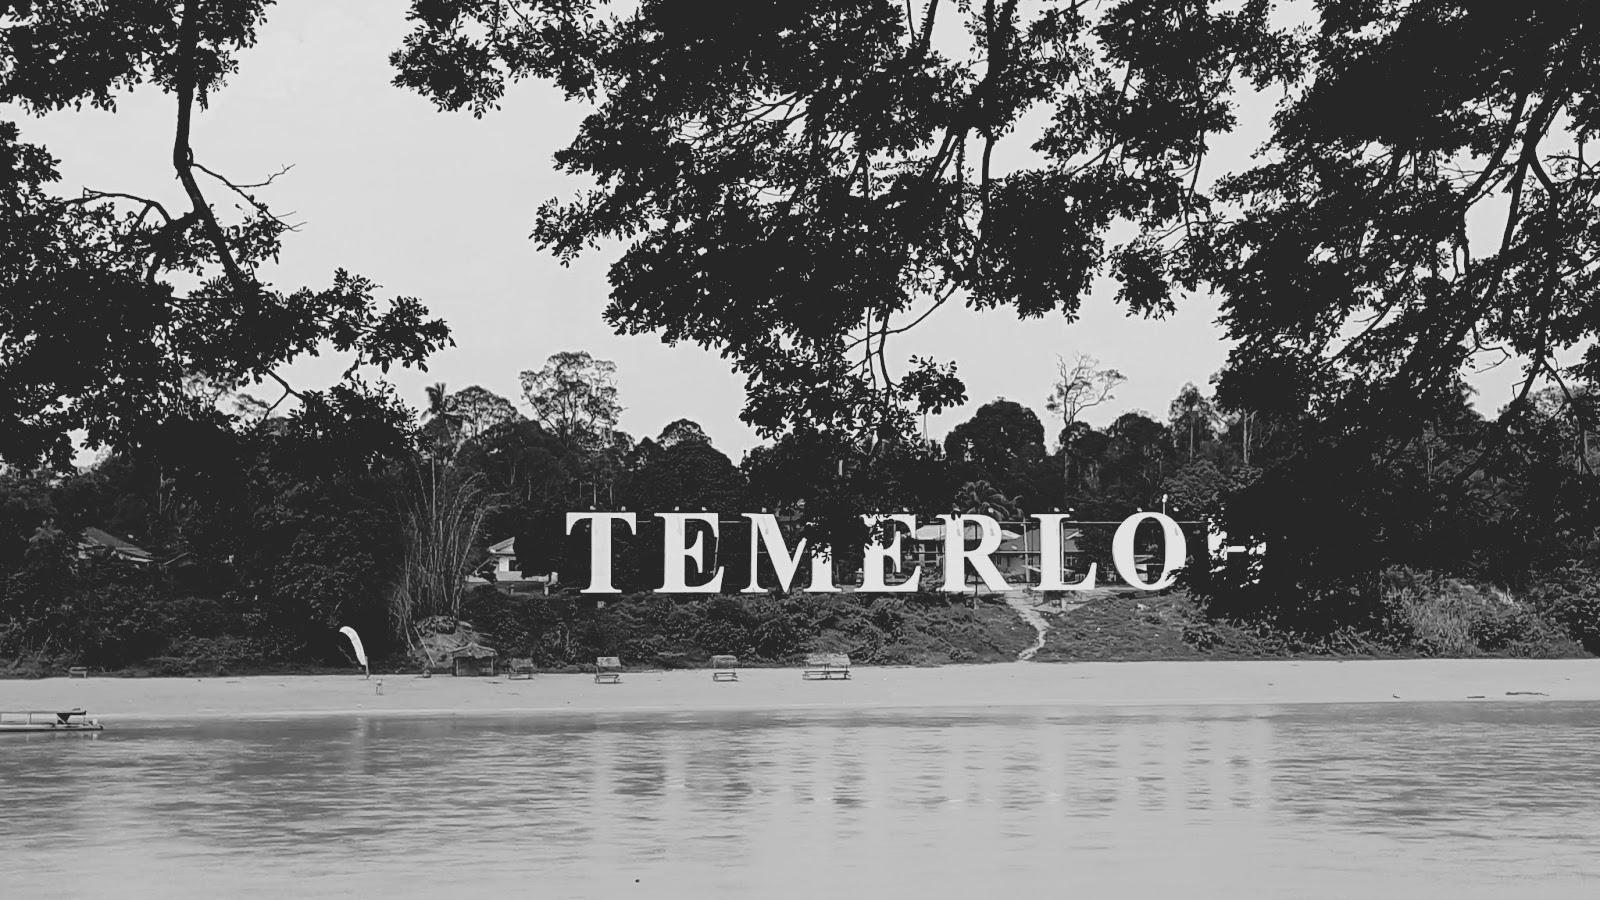 Temerloh, bandar ikan patin